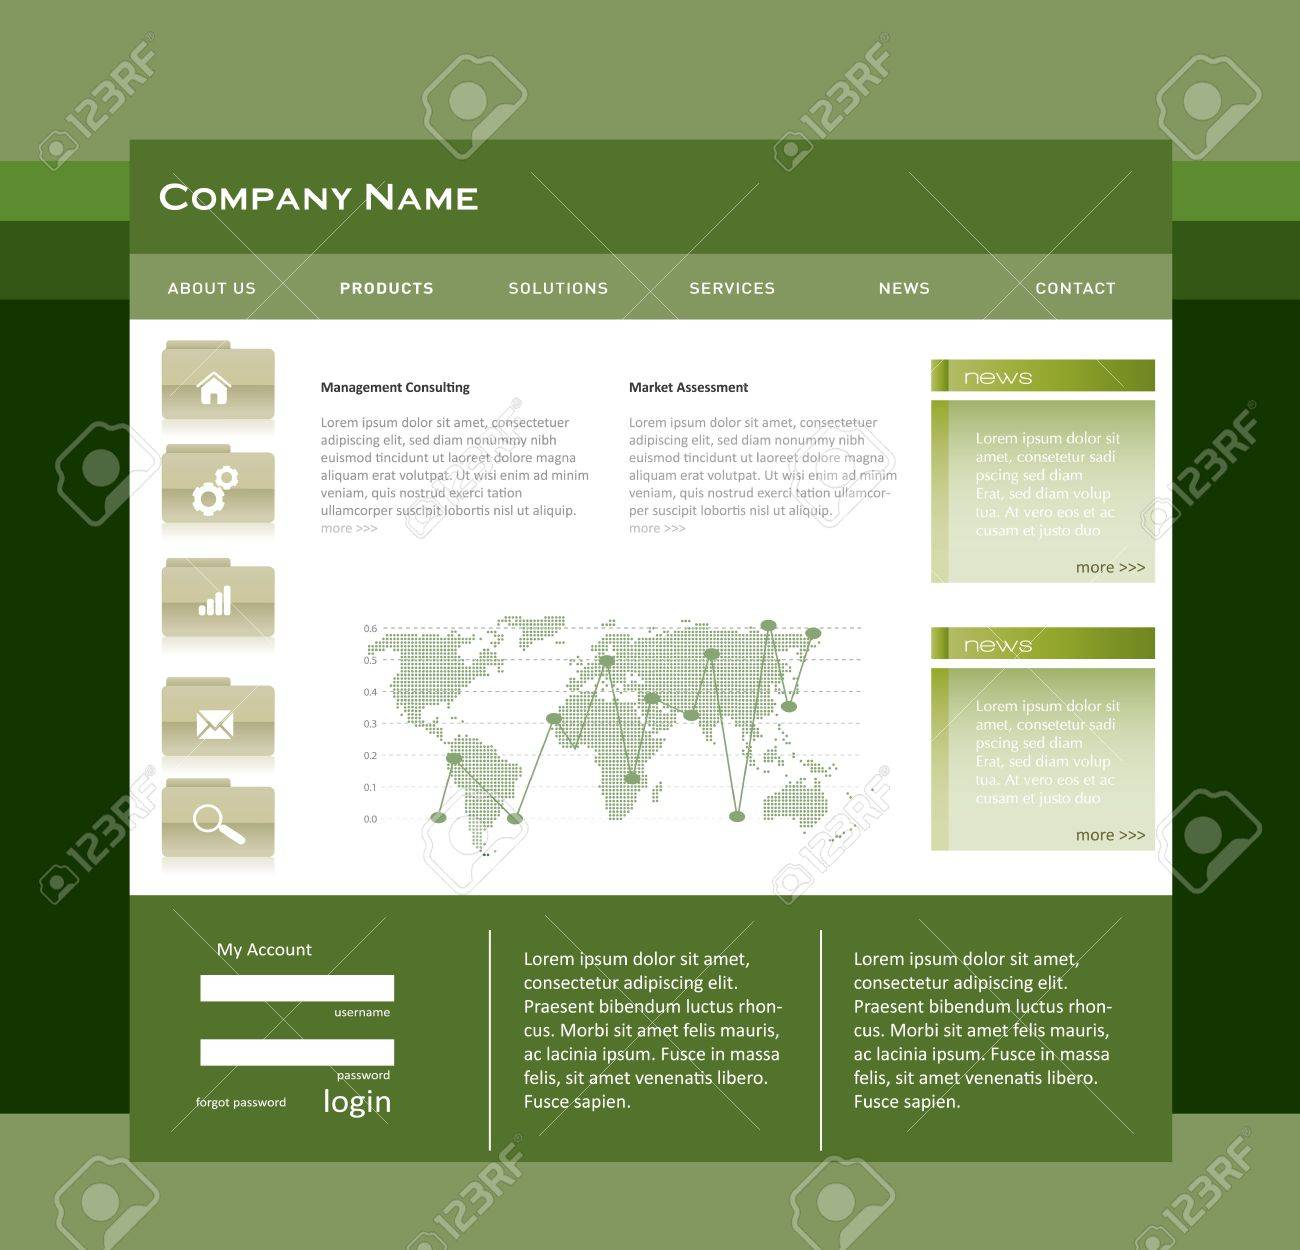 Simple Website Template In Editable Vector Format Royalty Free ...